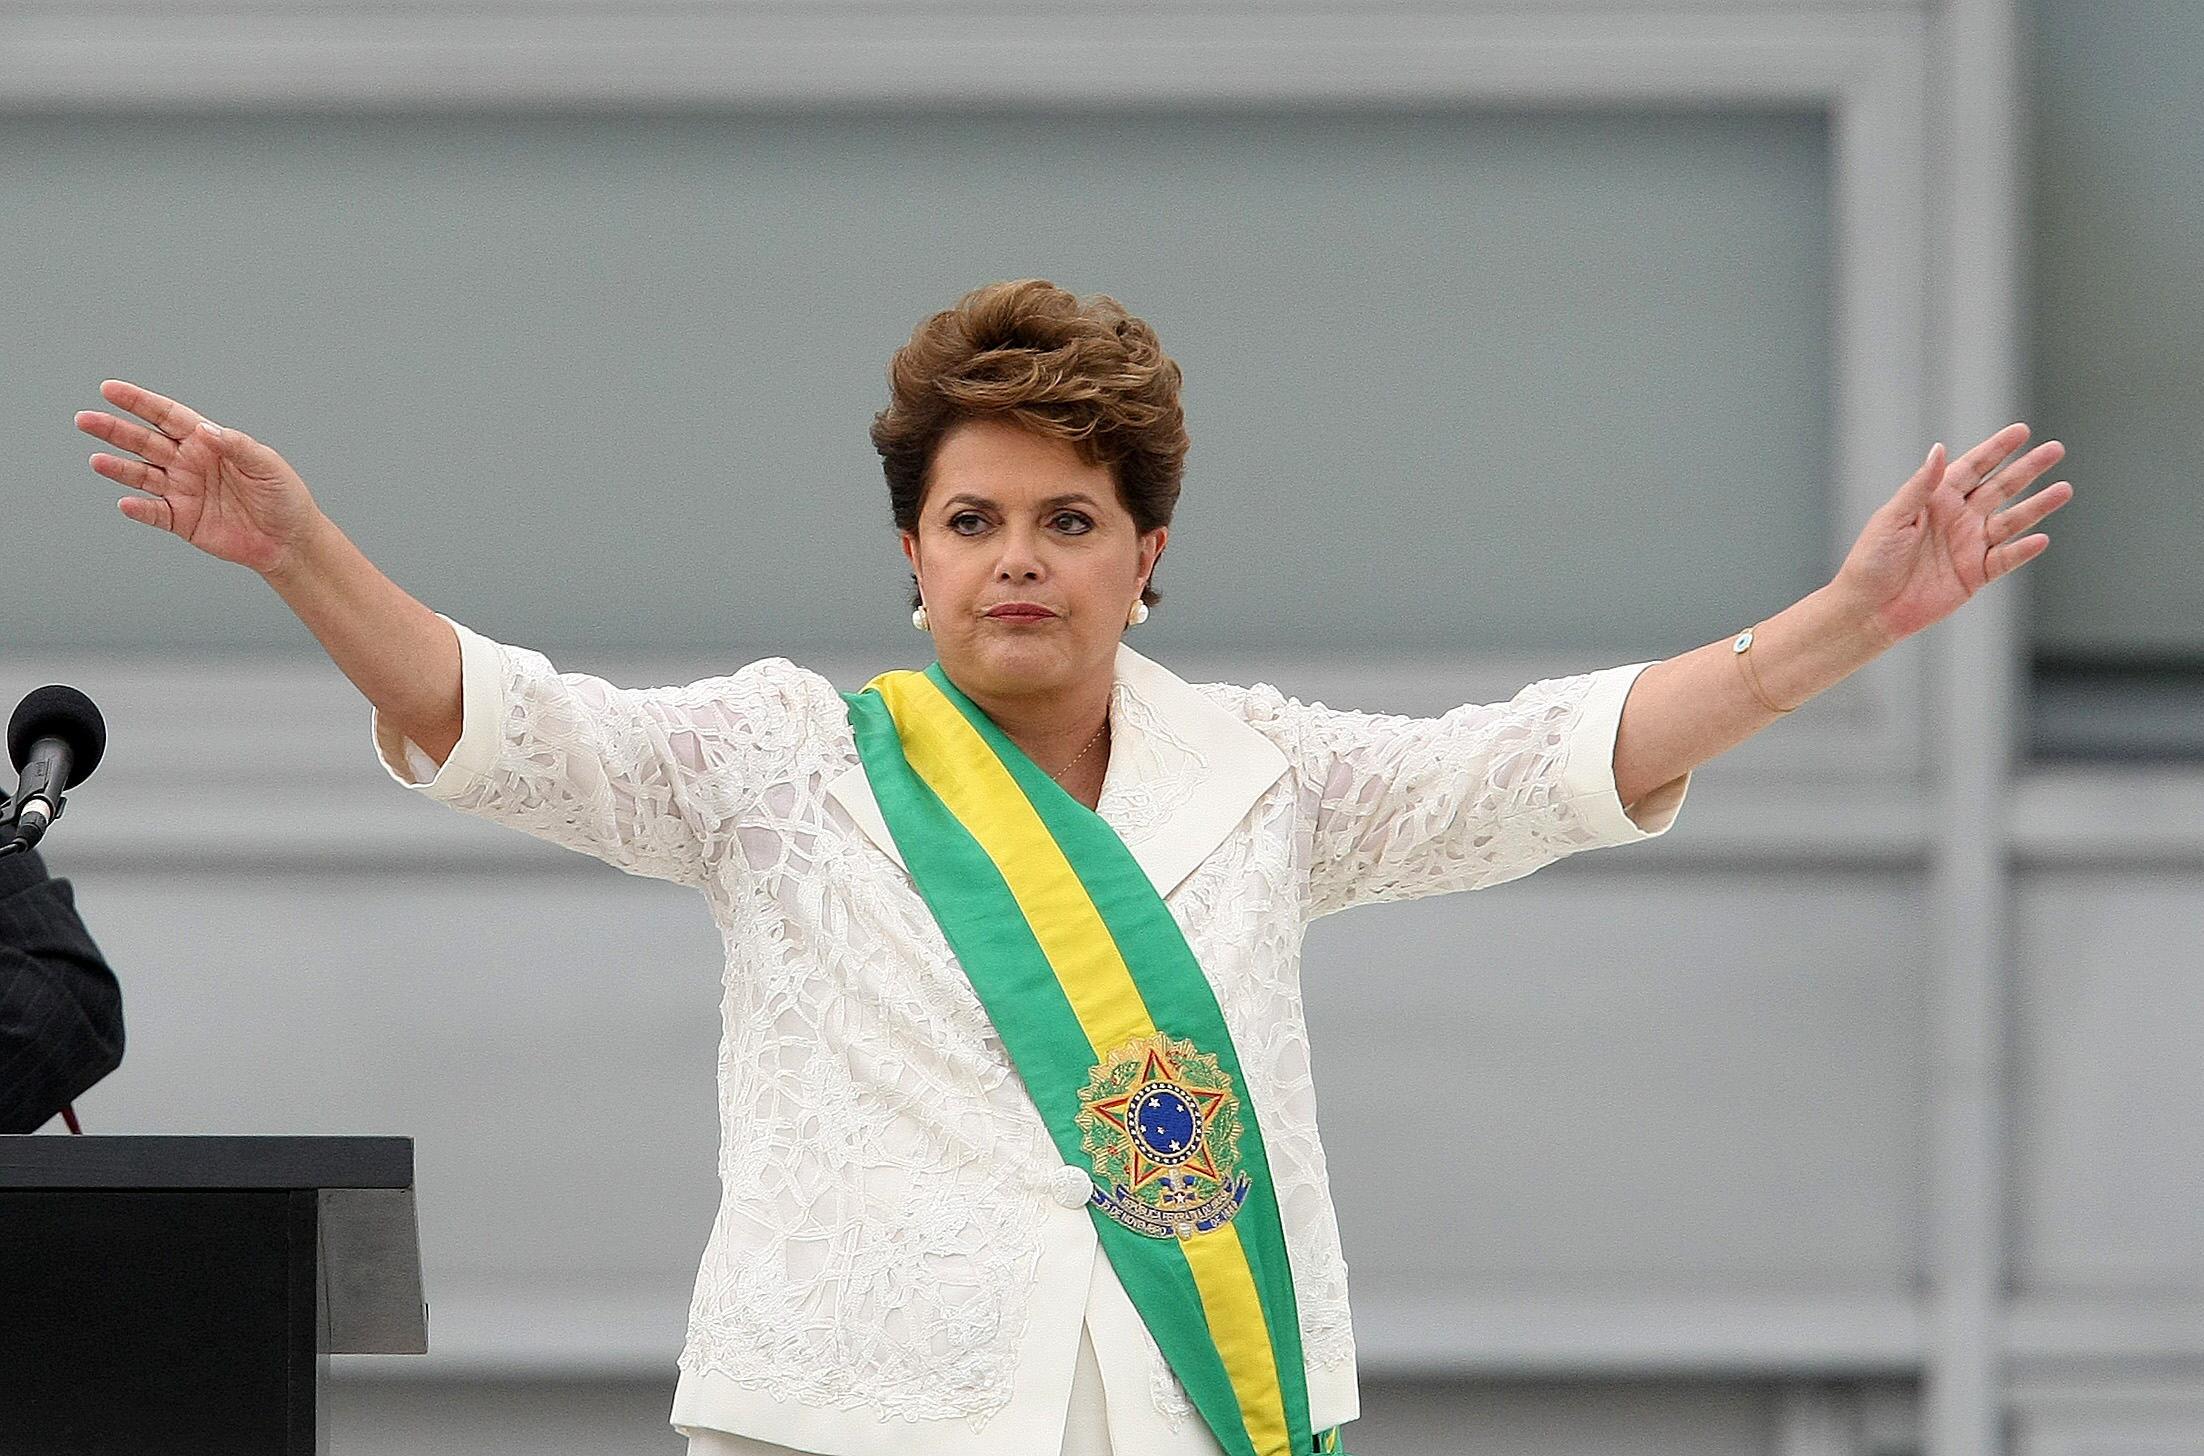 DILMA ROUSSEFF, LA PRIMERA MUJER EN LA JEFATURA DE ESTADO DE BRASIL